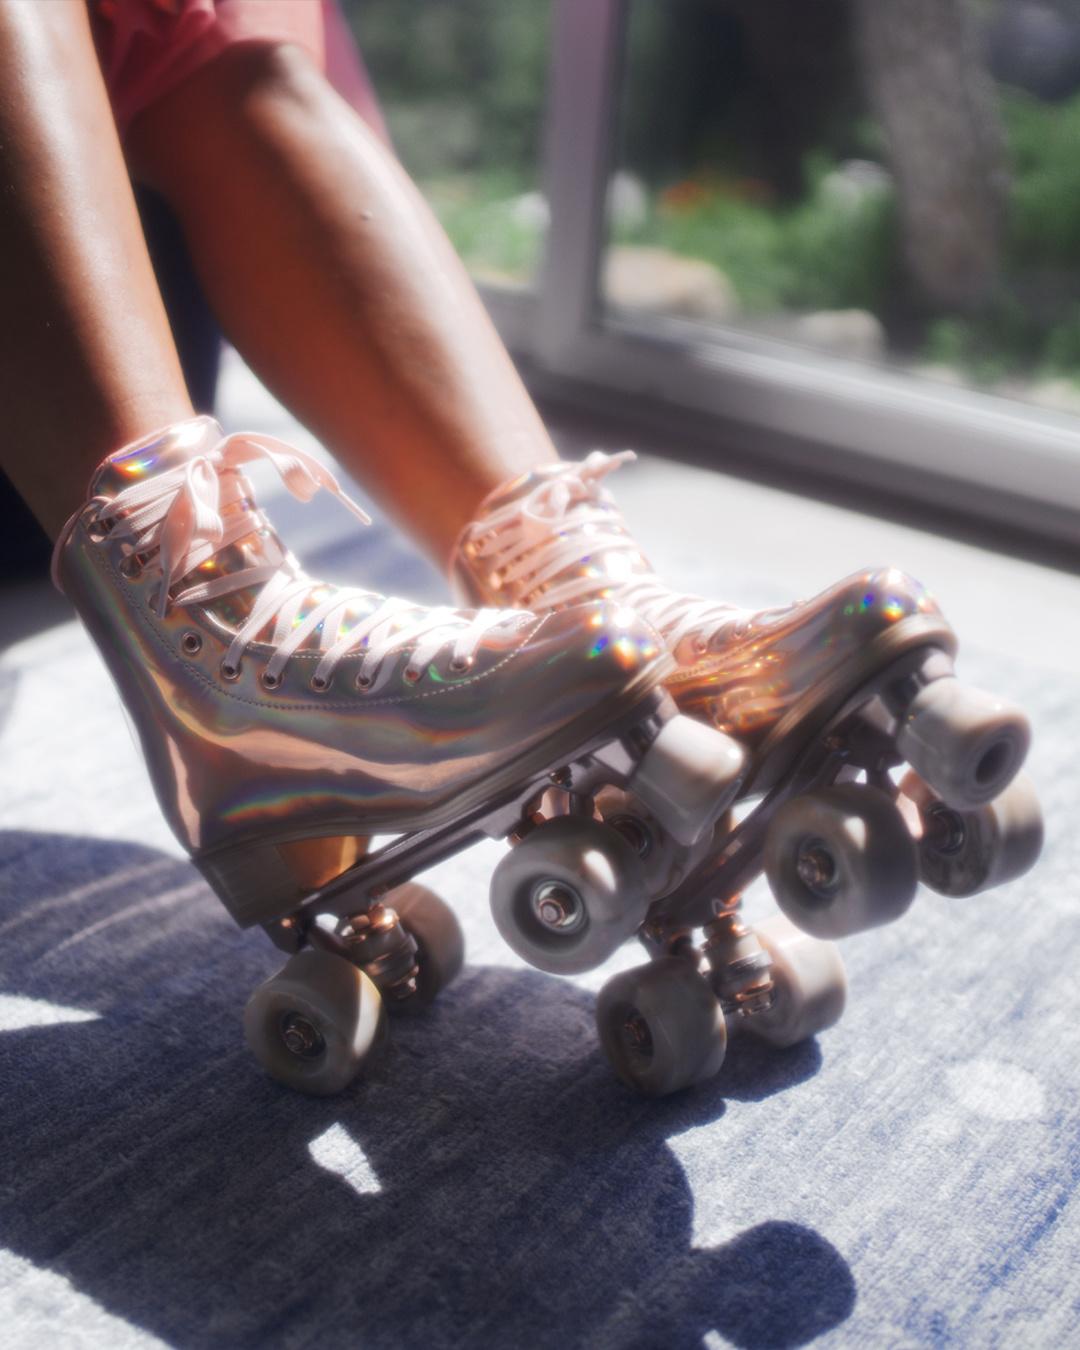 Impala Marawa rolschaatsen rijgen